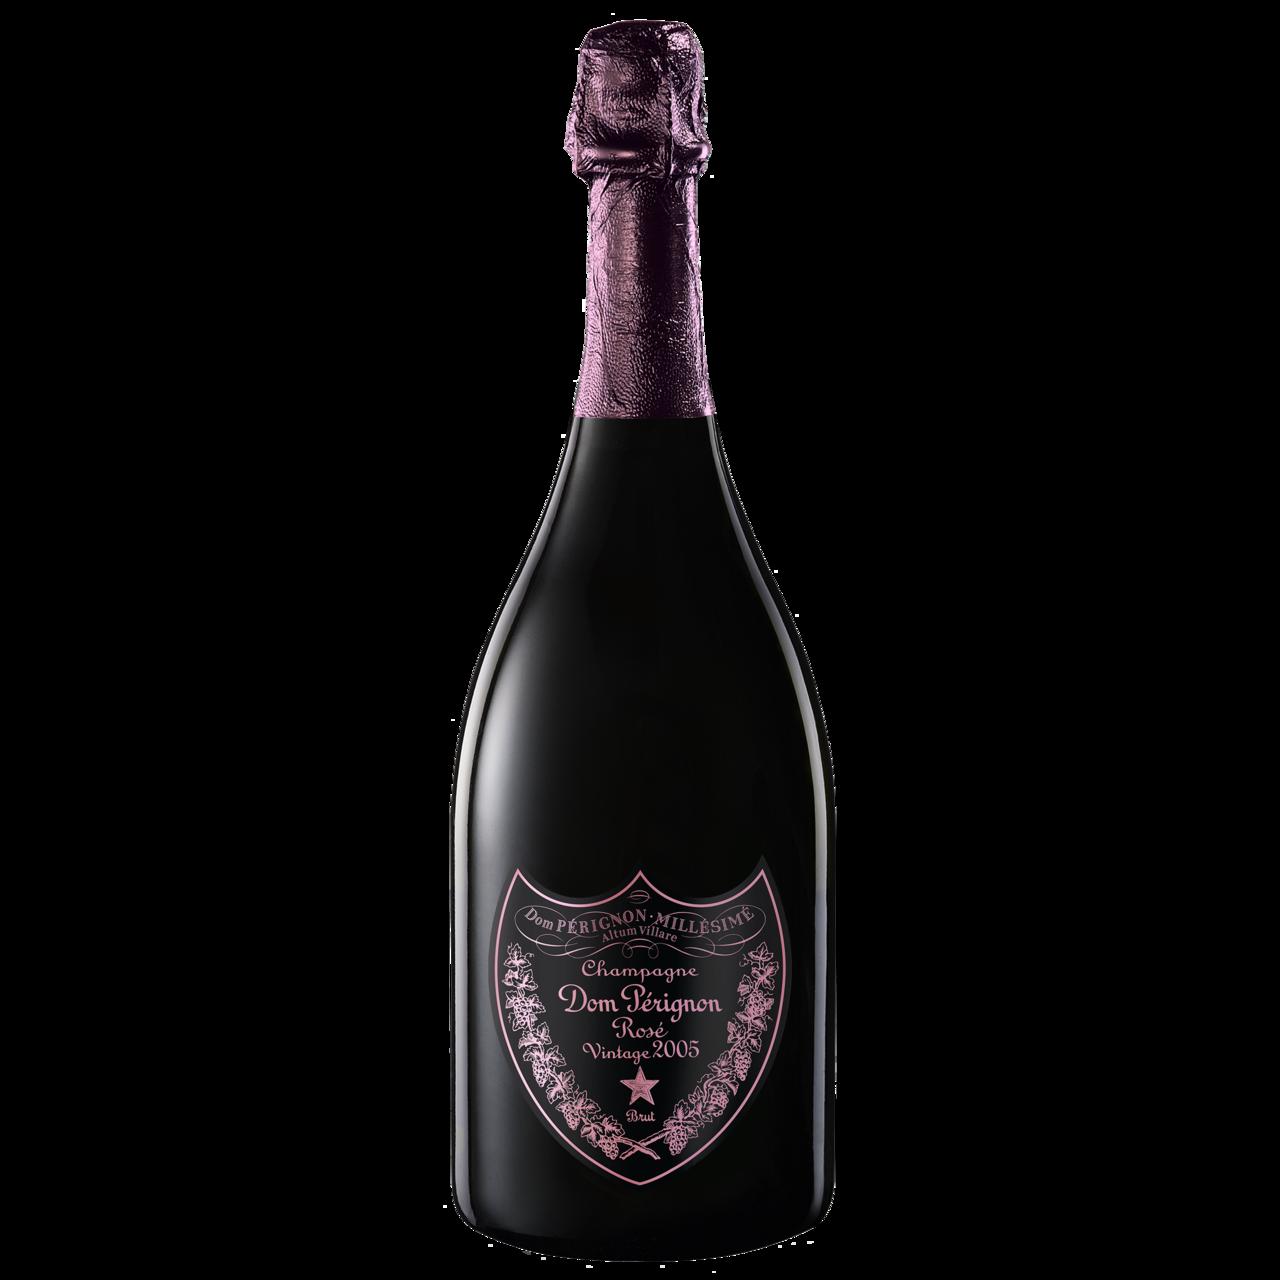 Dom Pérignon Rosé 2005